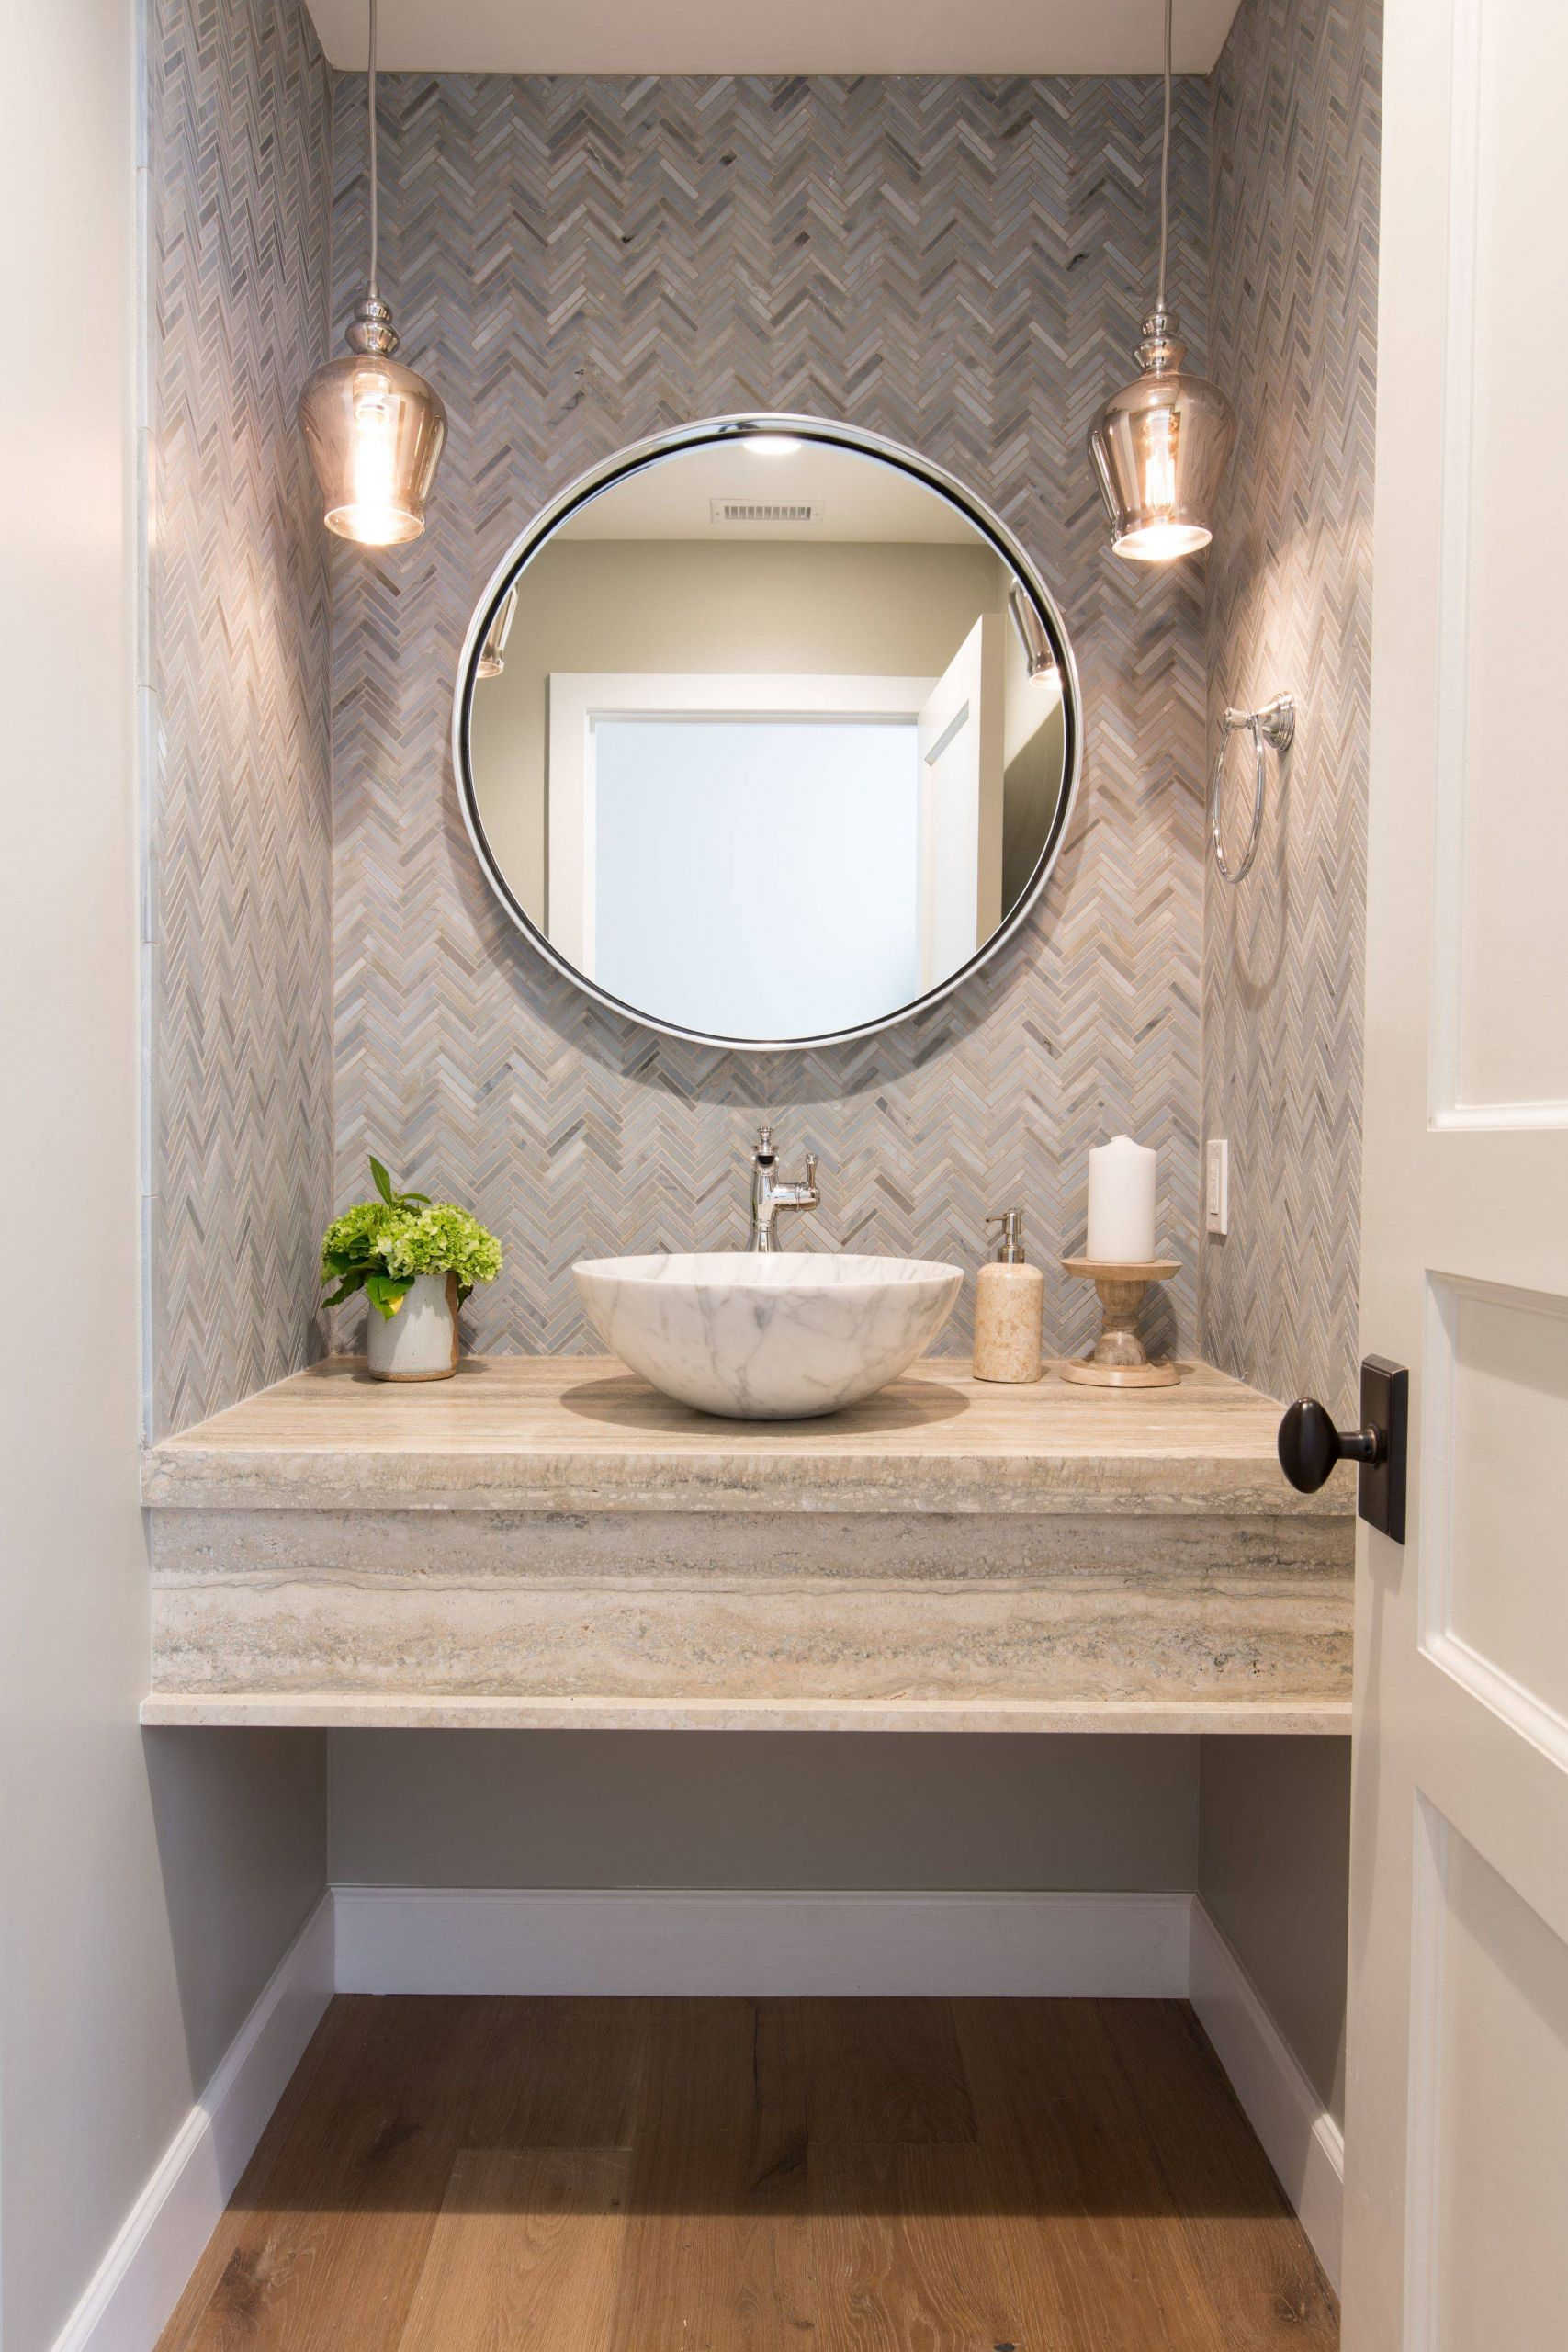 Best Of Decorative Powder Room Mirrors Fresh Wall Tile & Pendant Lights